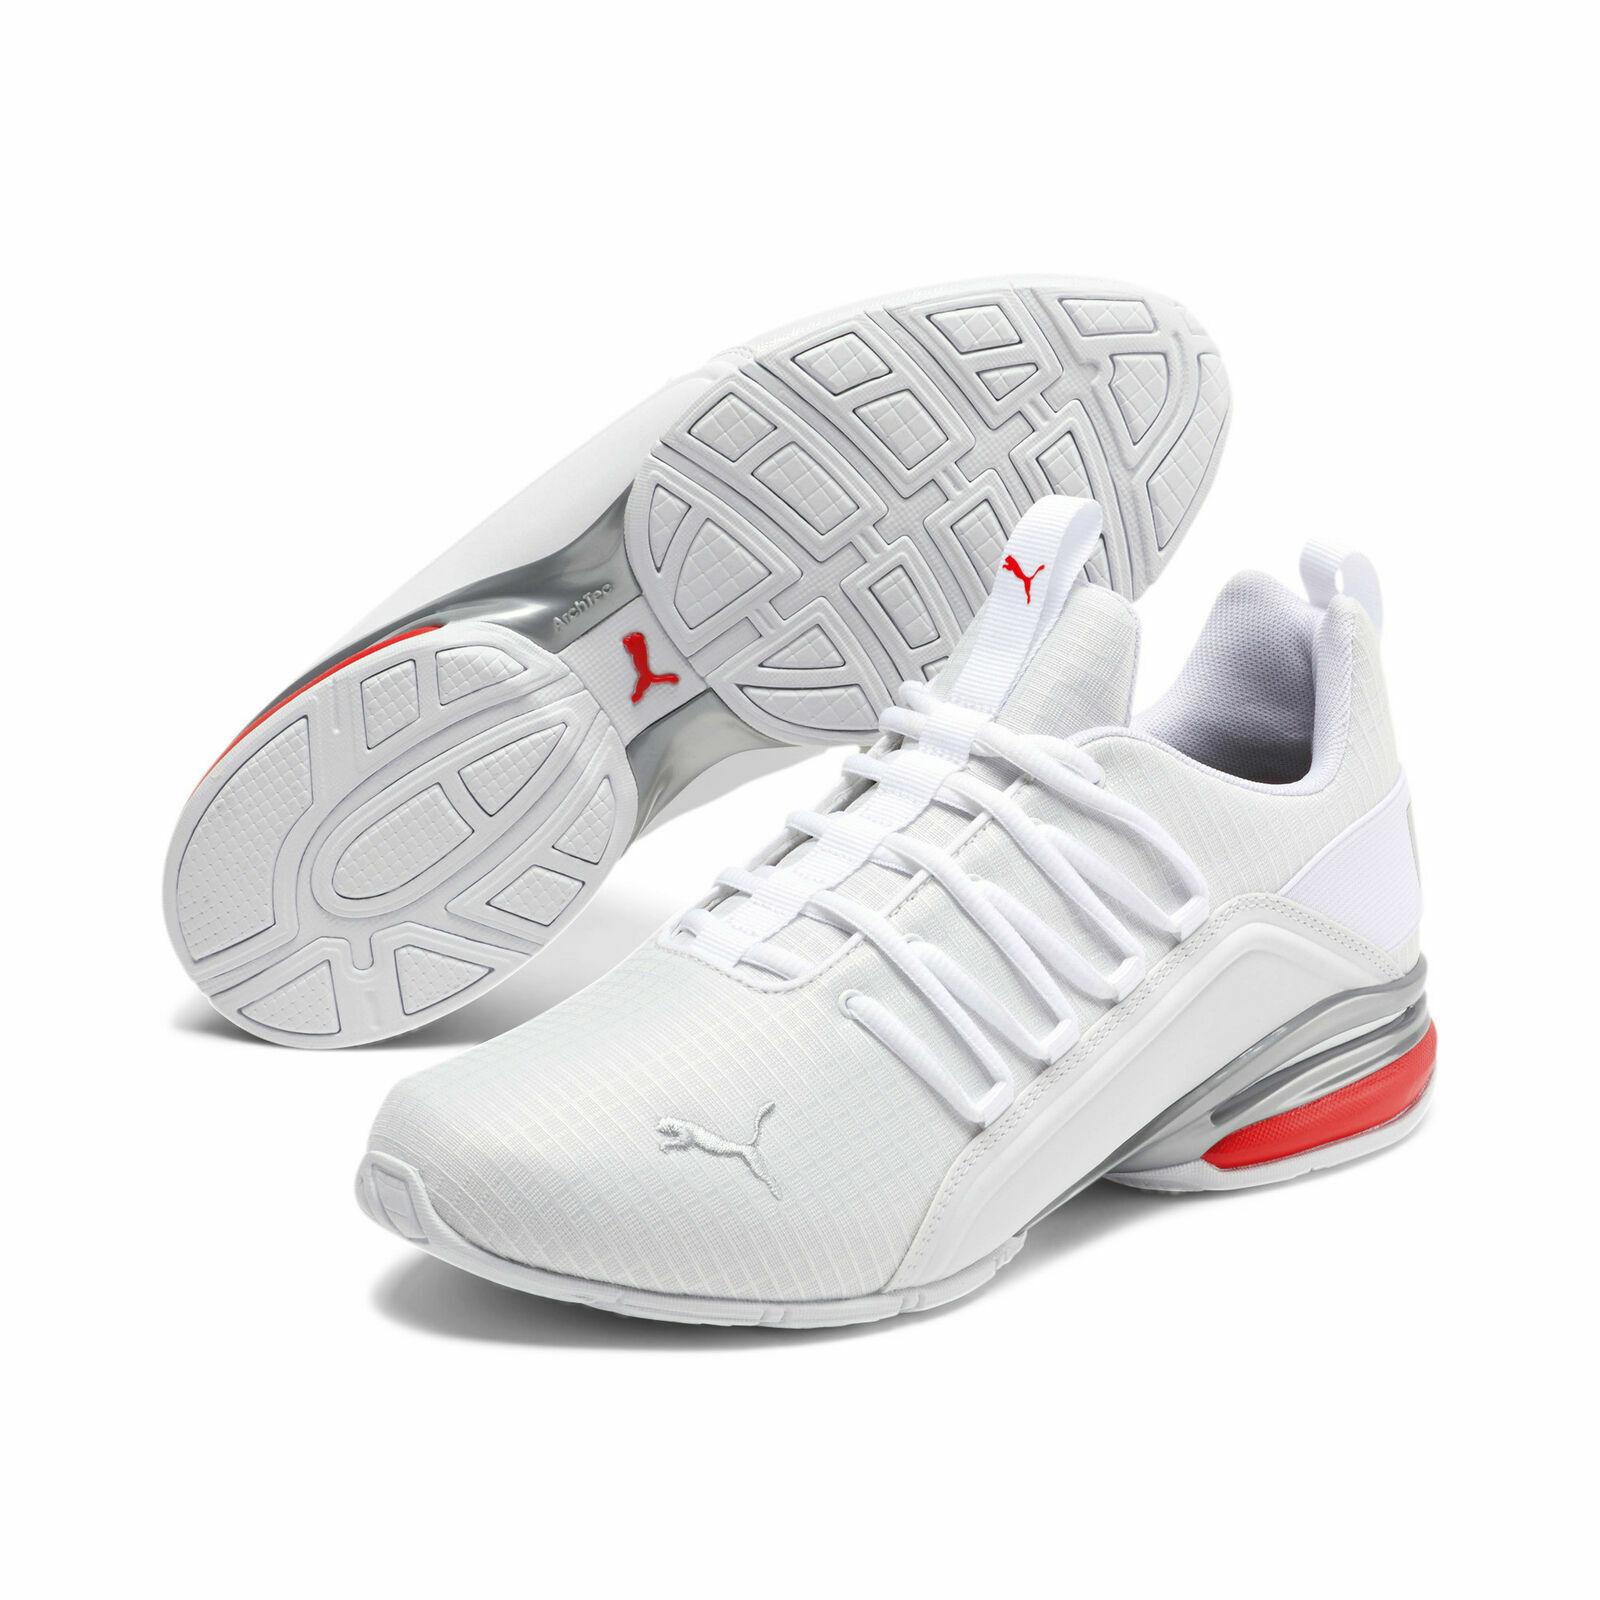 PUMA Men's Momenta Ripstop Training Shoes Free Shipping